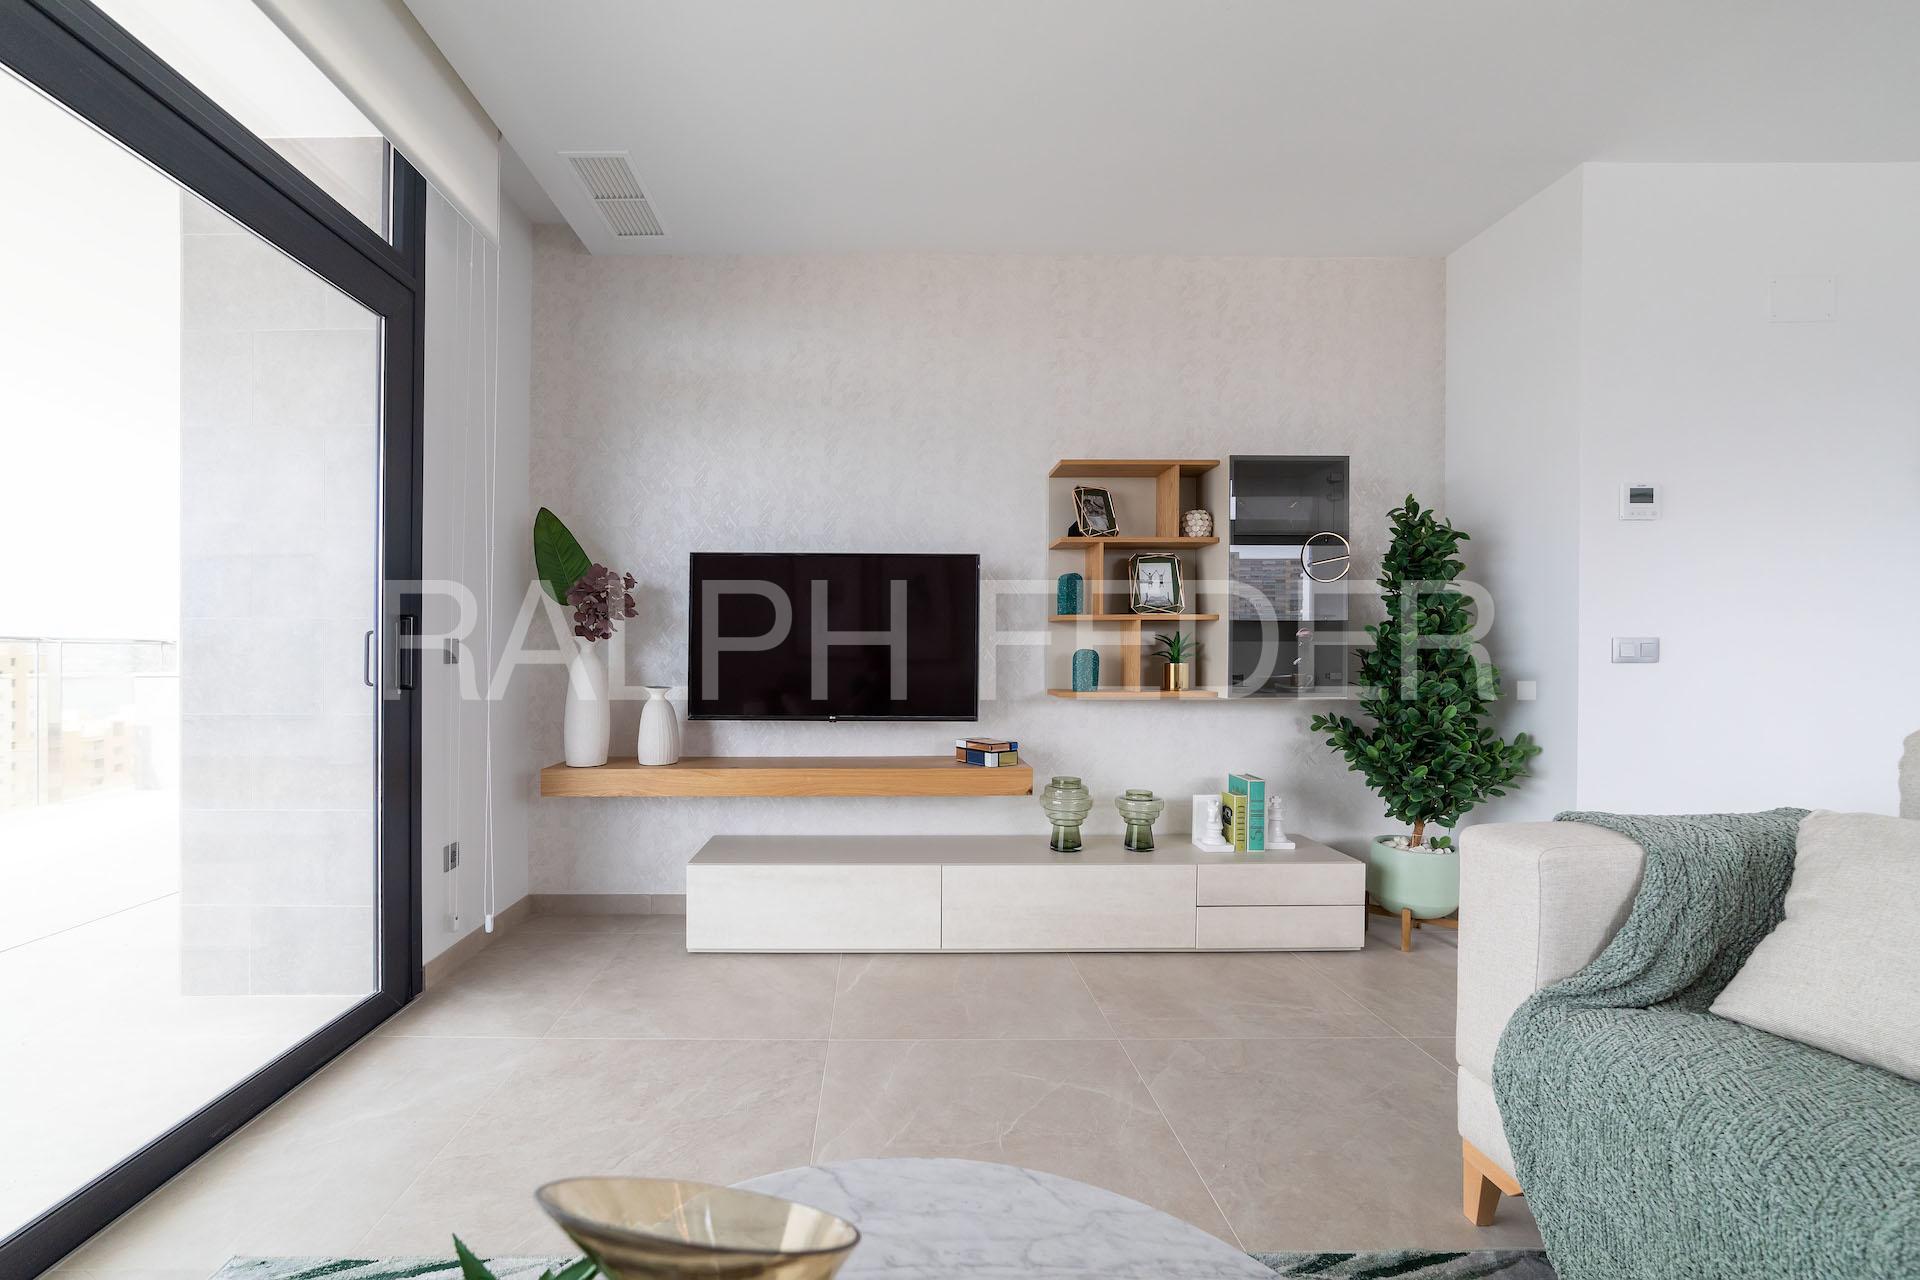 Penthouse in Benidorm